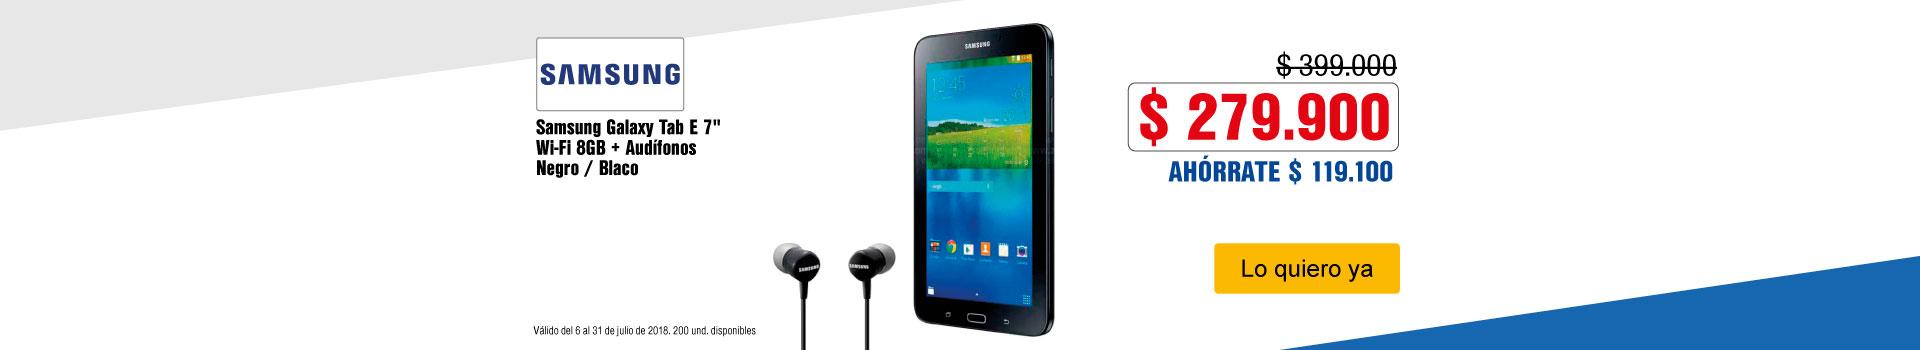 AK-KT-BCAT-4-computadores y tablets-PP---Samsung-Galaxy Tab E 7